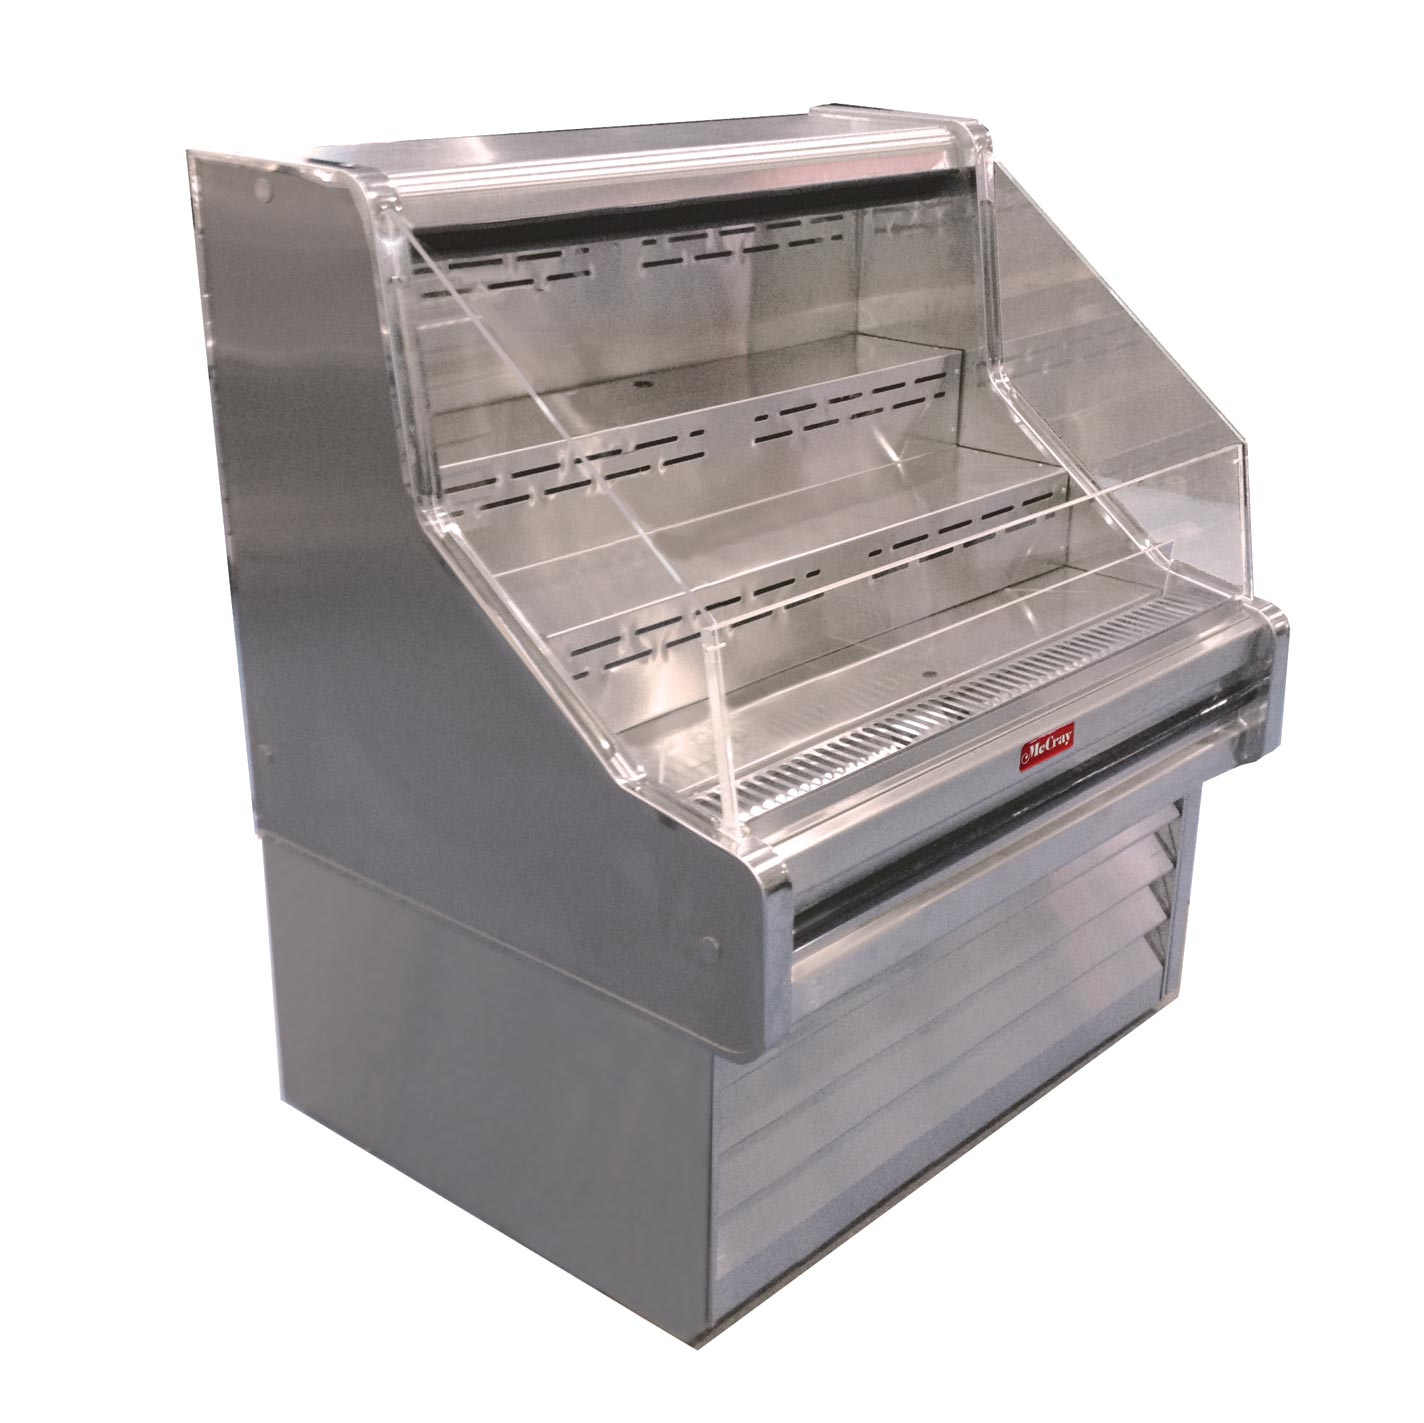 Howard-McCray R-OS35E-5 merchandiser, open refrigerated display